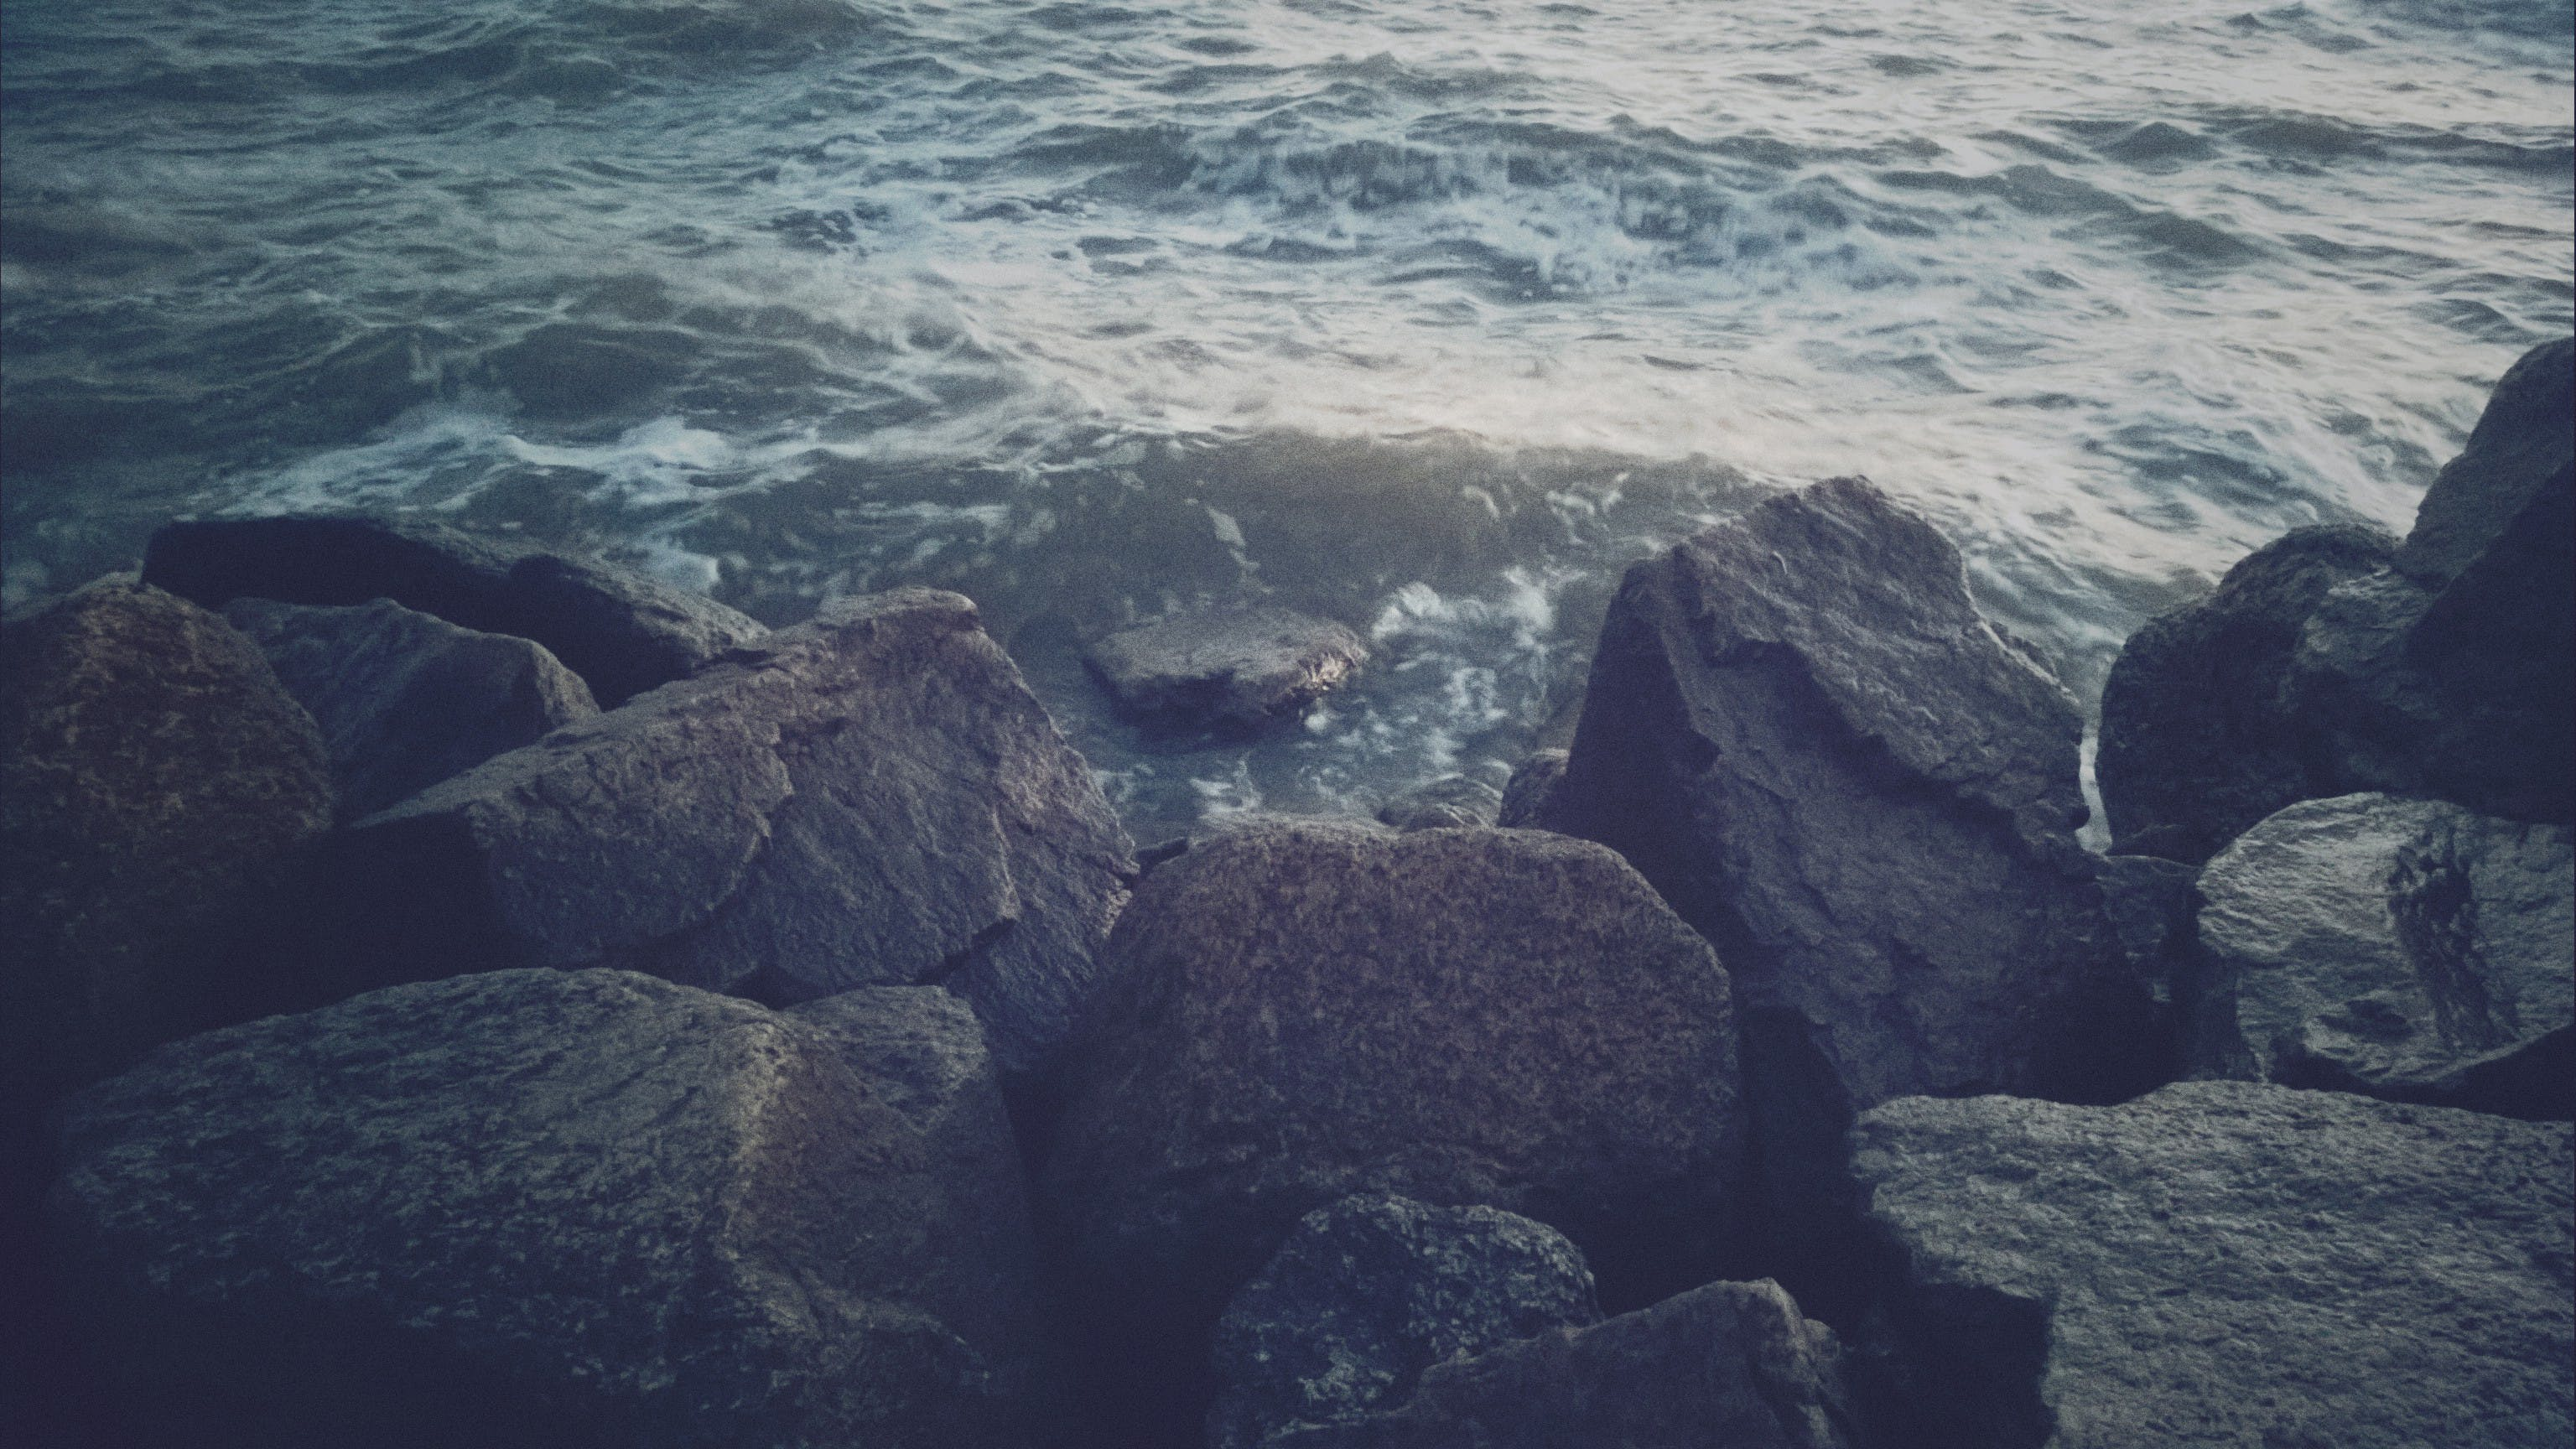 Free stock photo of sea beach, sea stones, storm